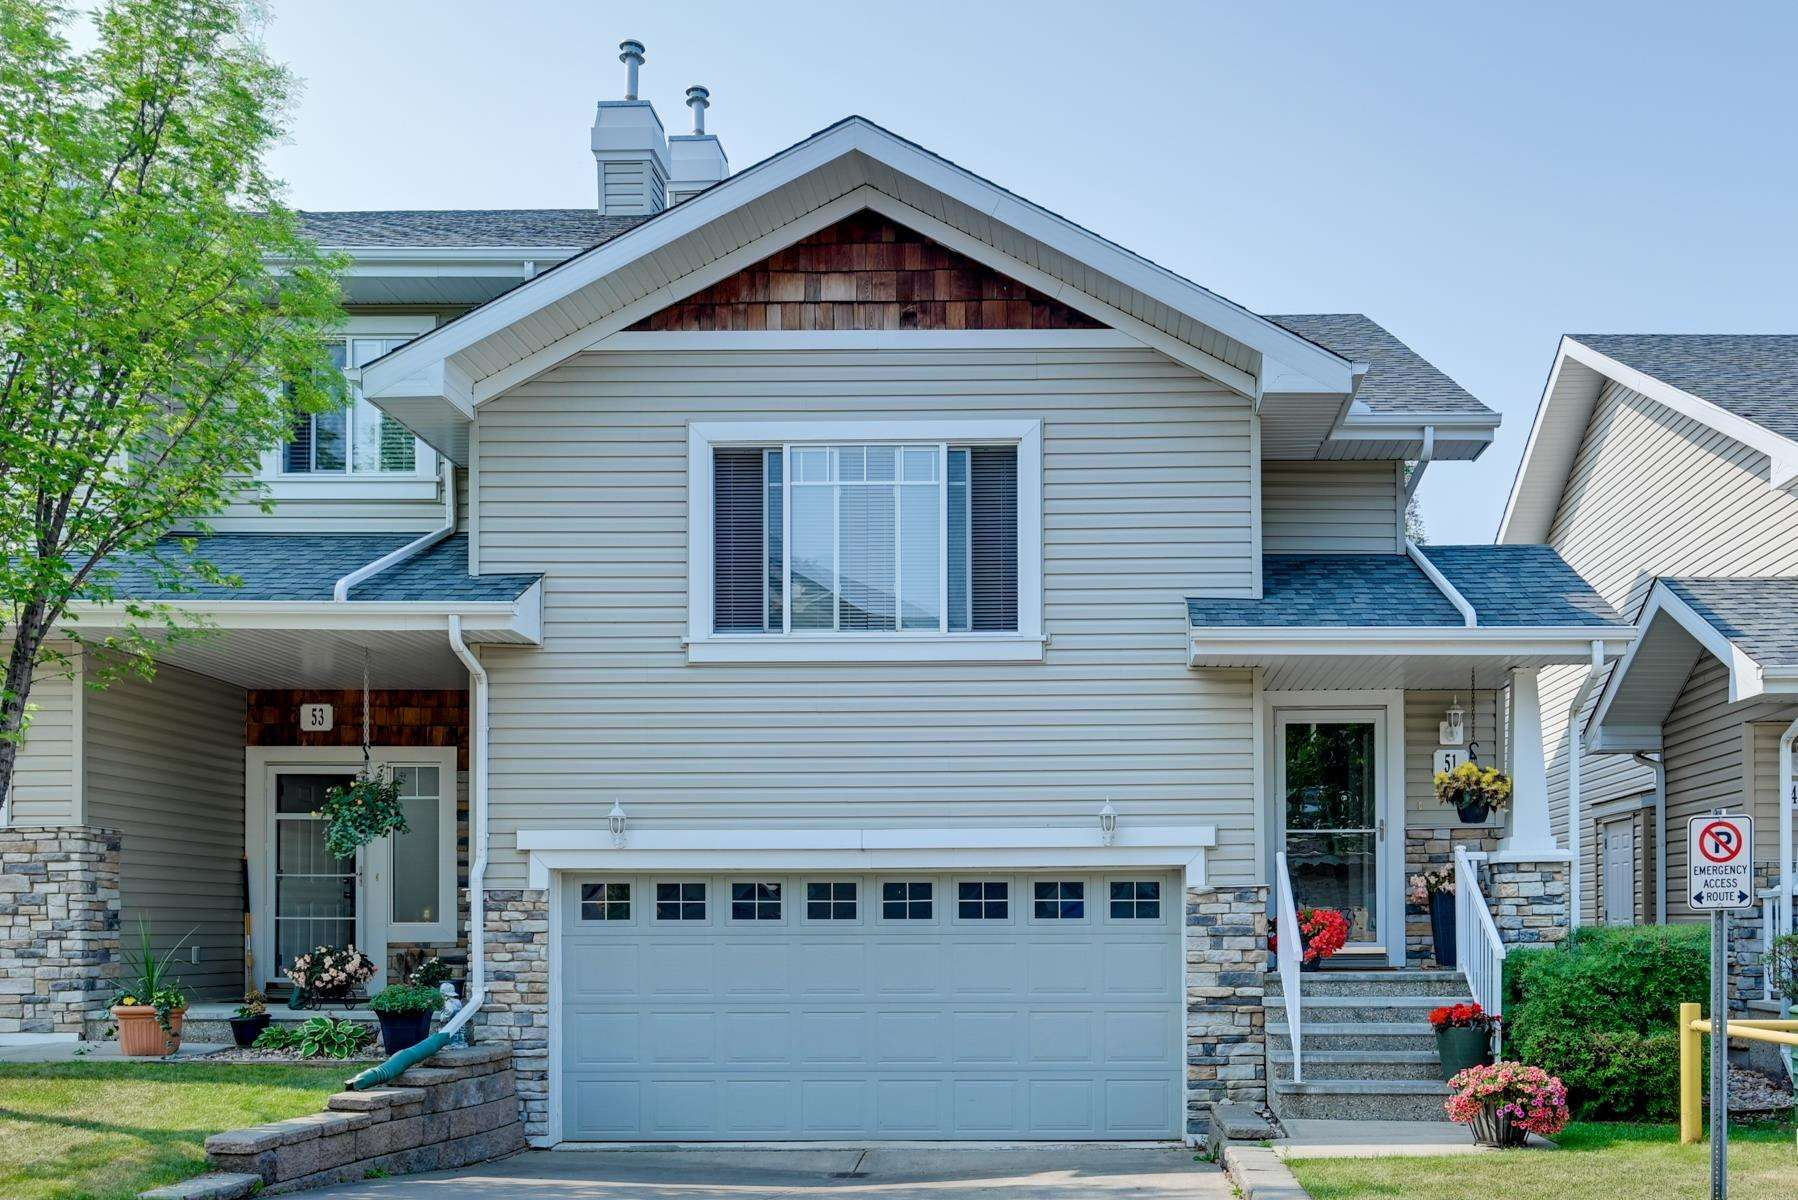 Main Photo: 51 2508 HANNA Crescent in Edmonton: Zone 14 Townhouse for sale : MLS®# E4256333